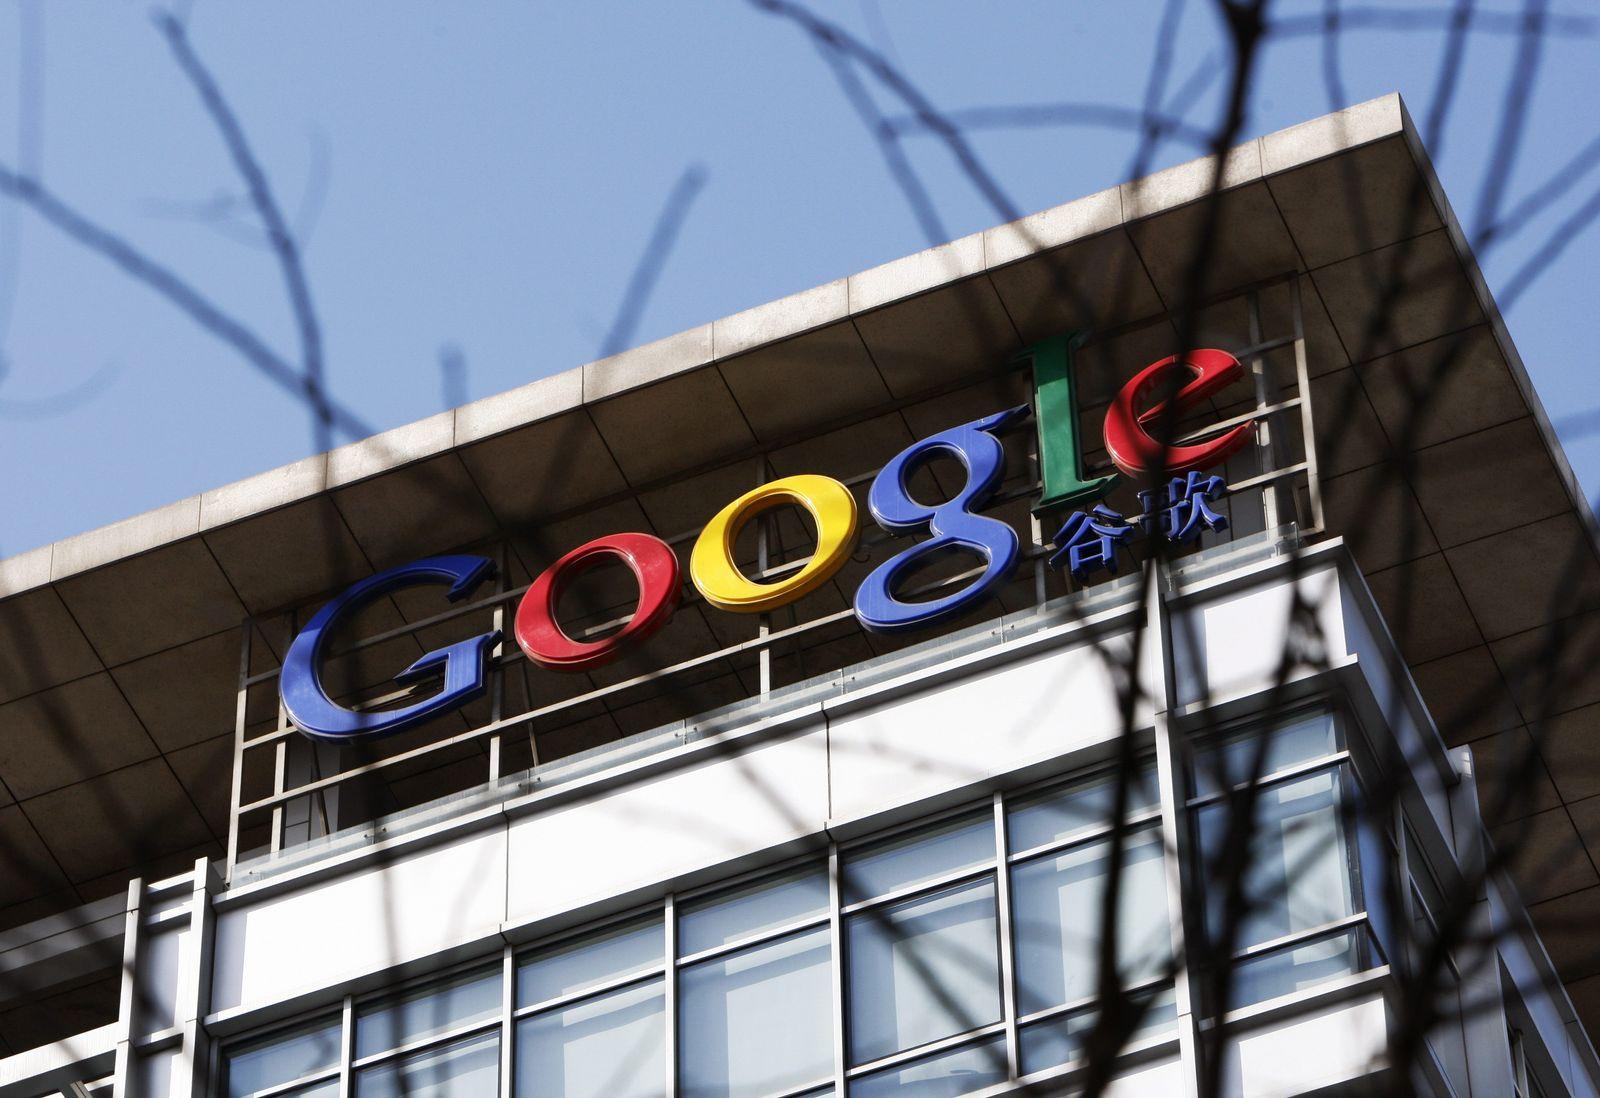 mmO Themenseite Google: Google-Zentrale in Peking